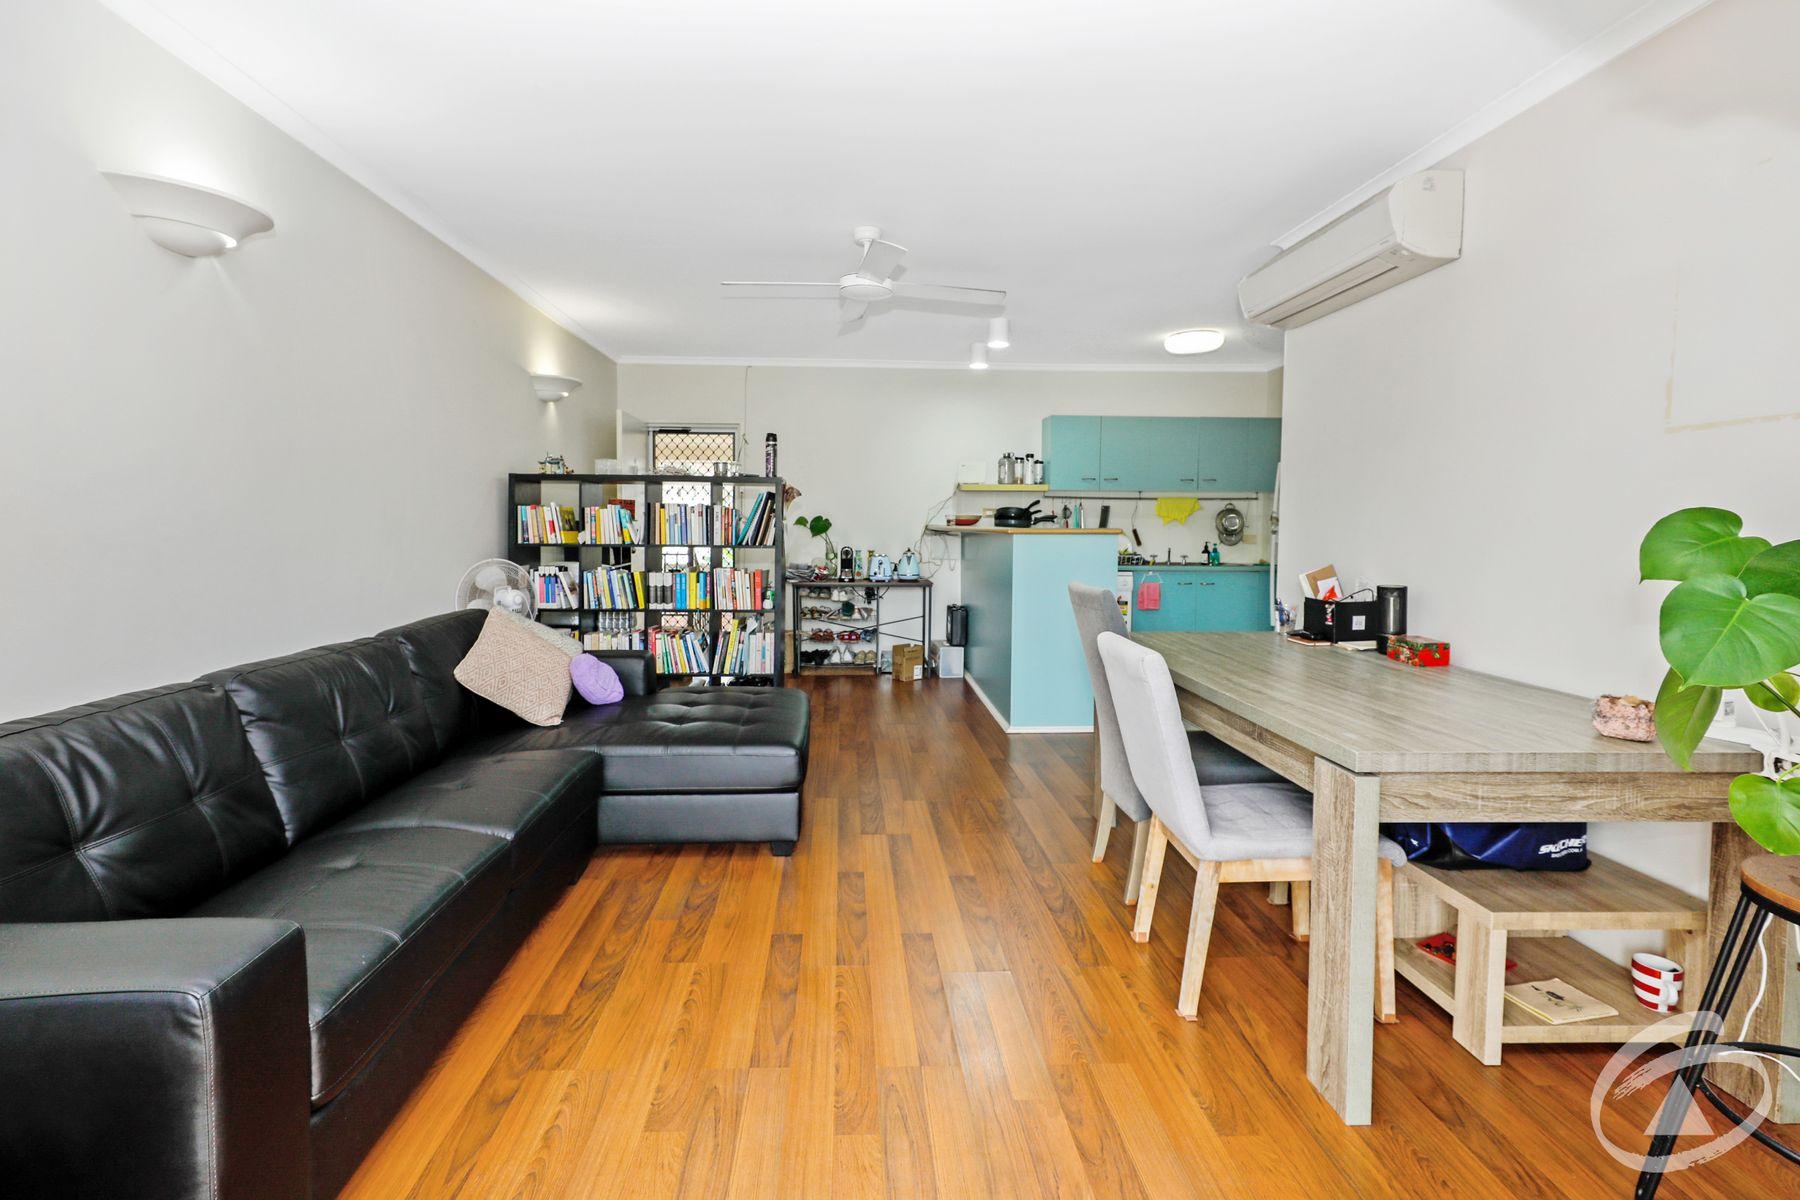 44/78-90 Digger Street, Cairns North, QLD 4870